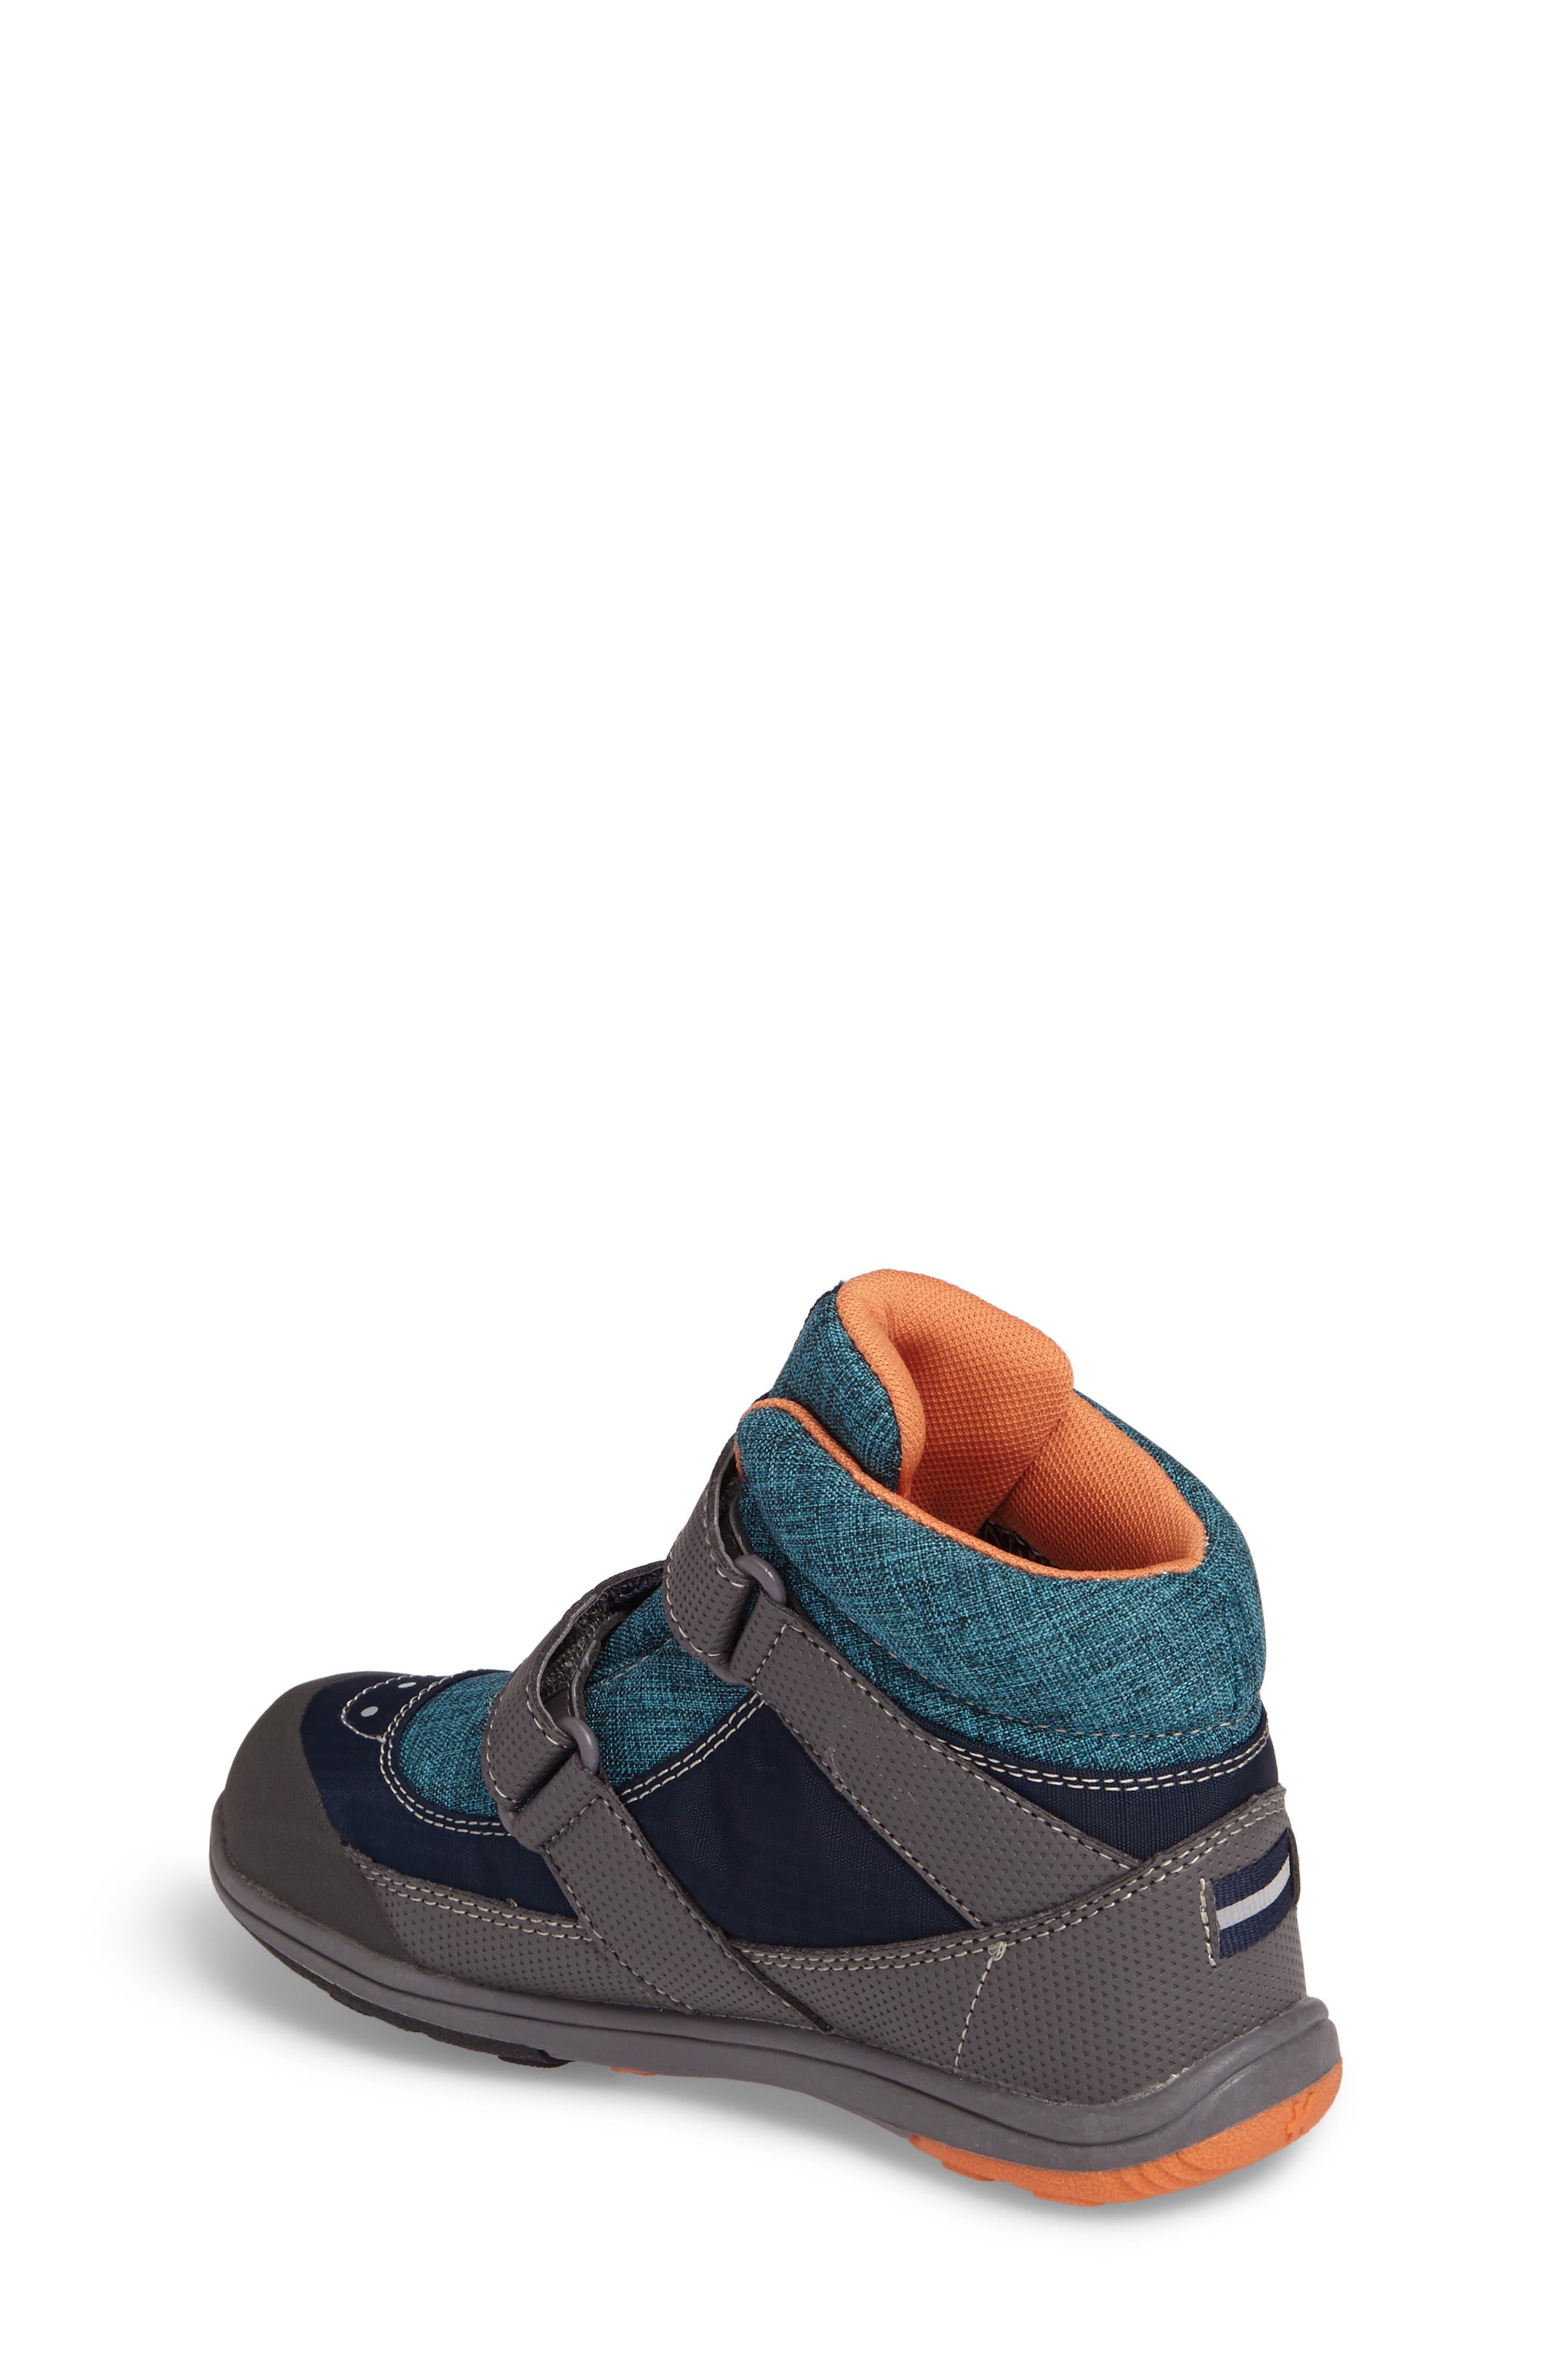 'Atlas' Waterproof Boot,                             Alternate thumbnail 2, color,                             Blue